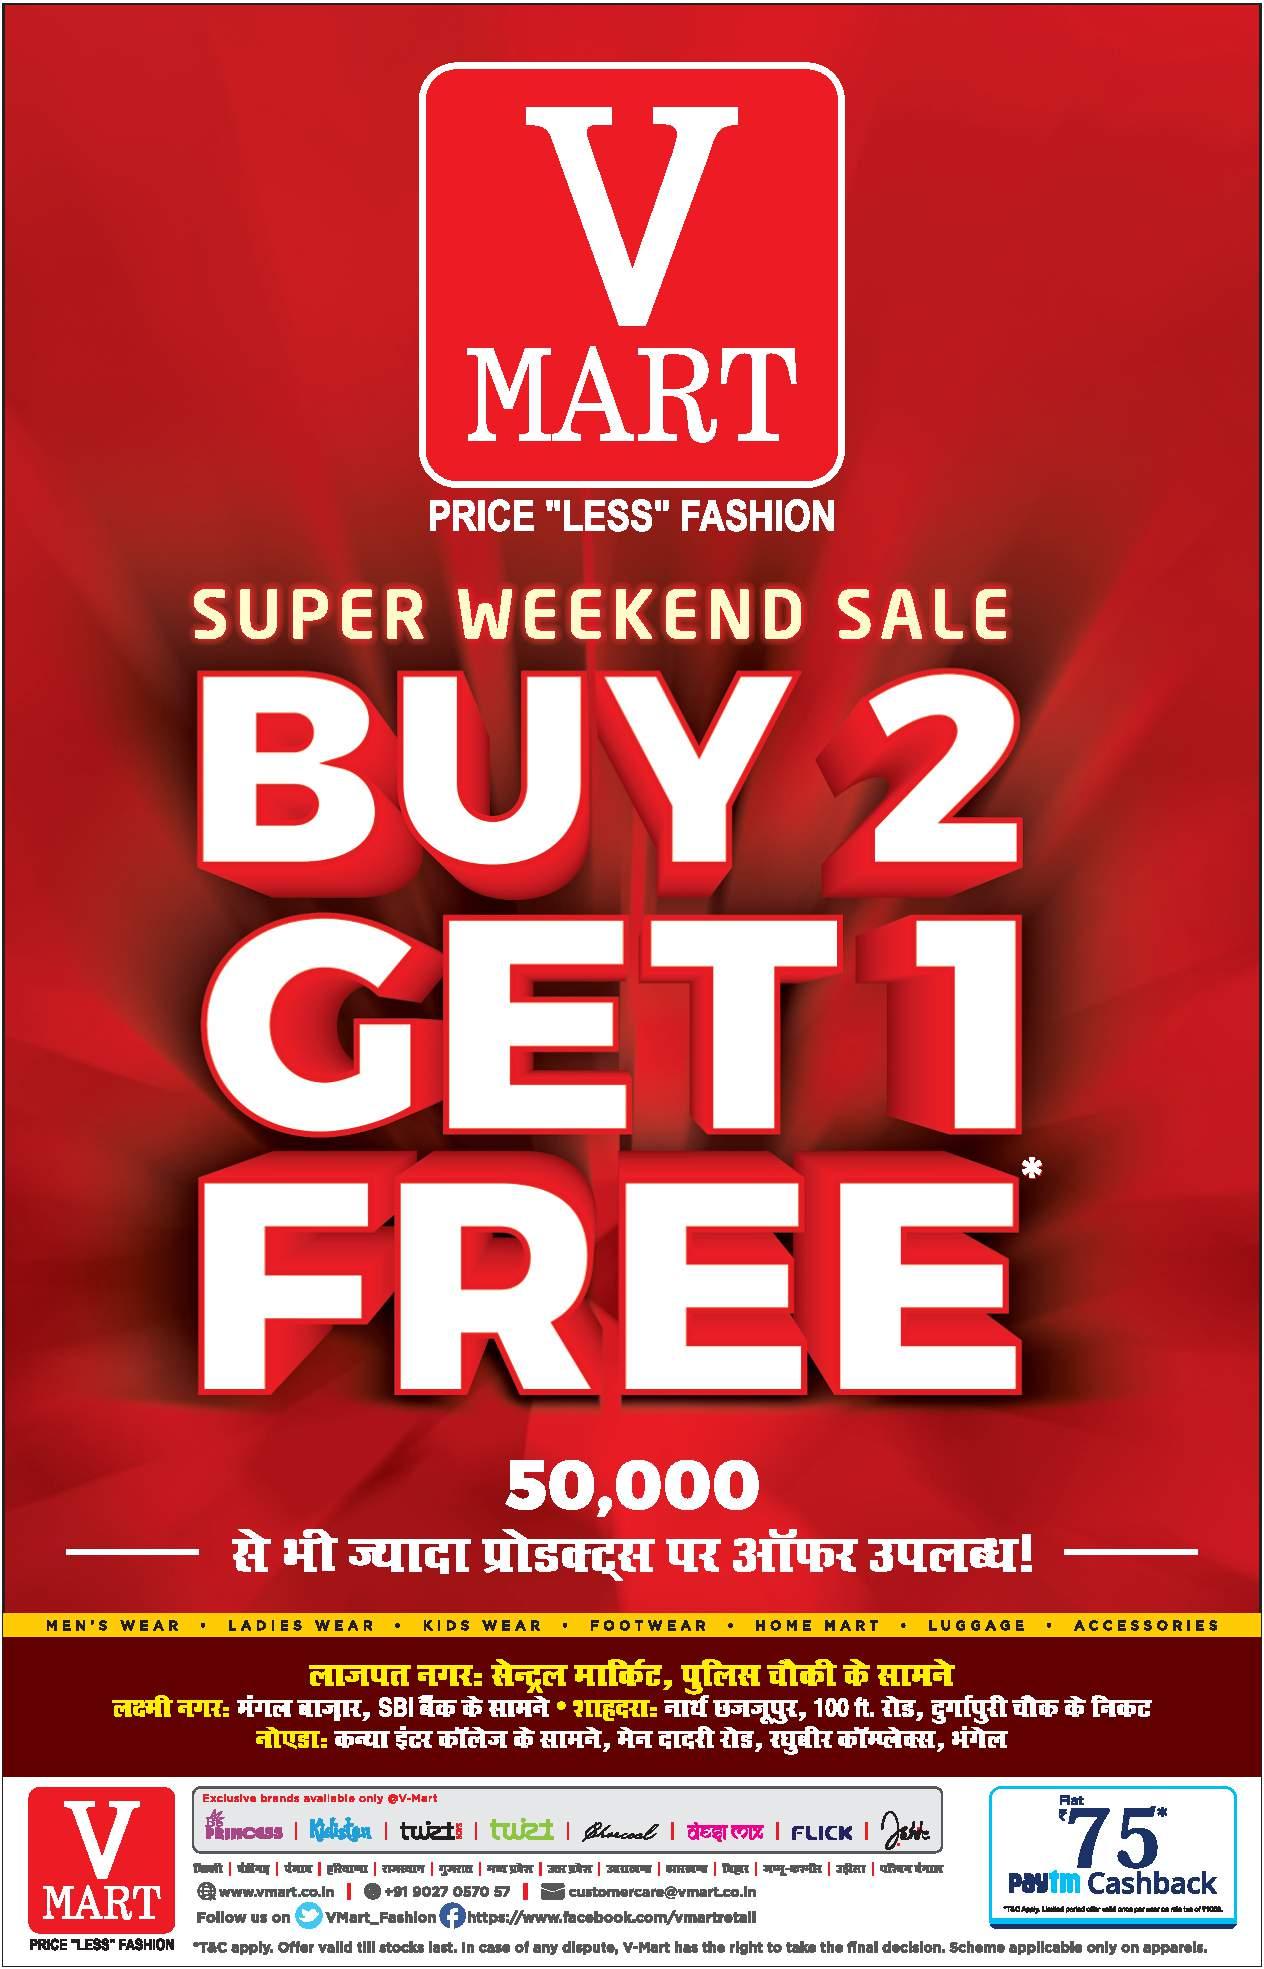 V Mart Super Weekend Sale Buy 2 Get 1 Free Ad - Advert Gallery 3bd958d9d8d